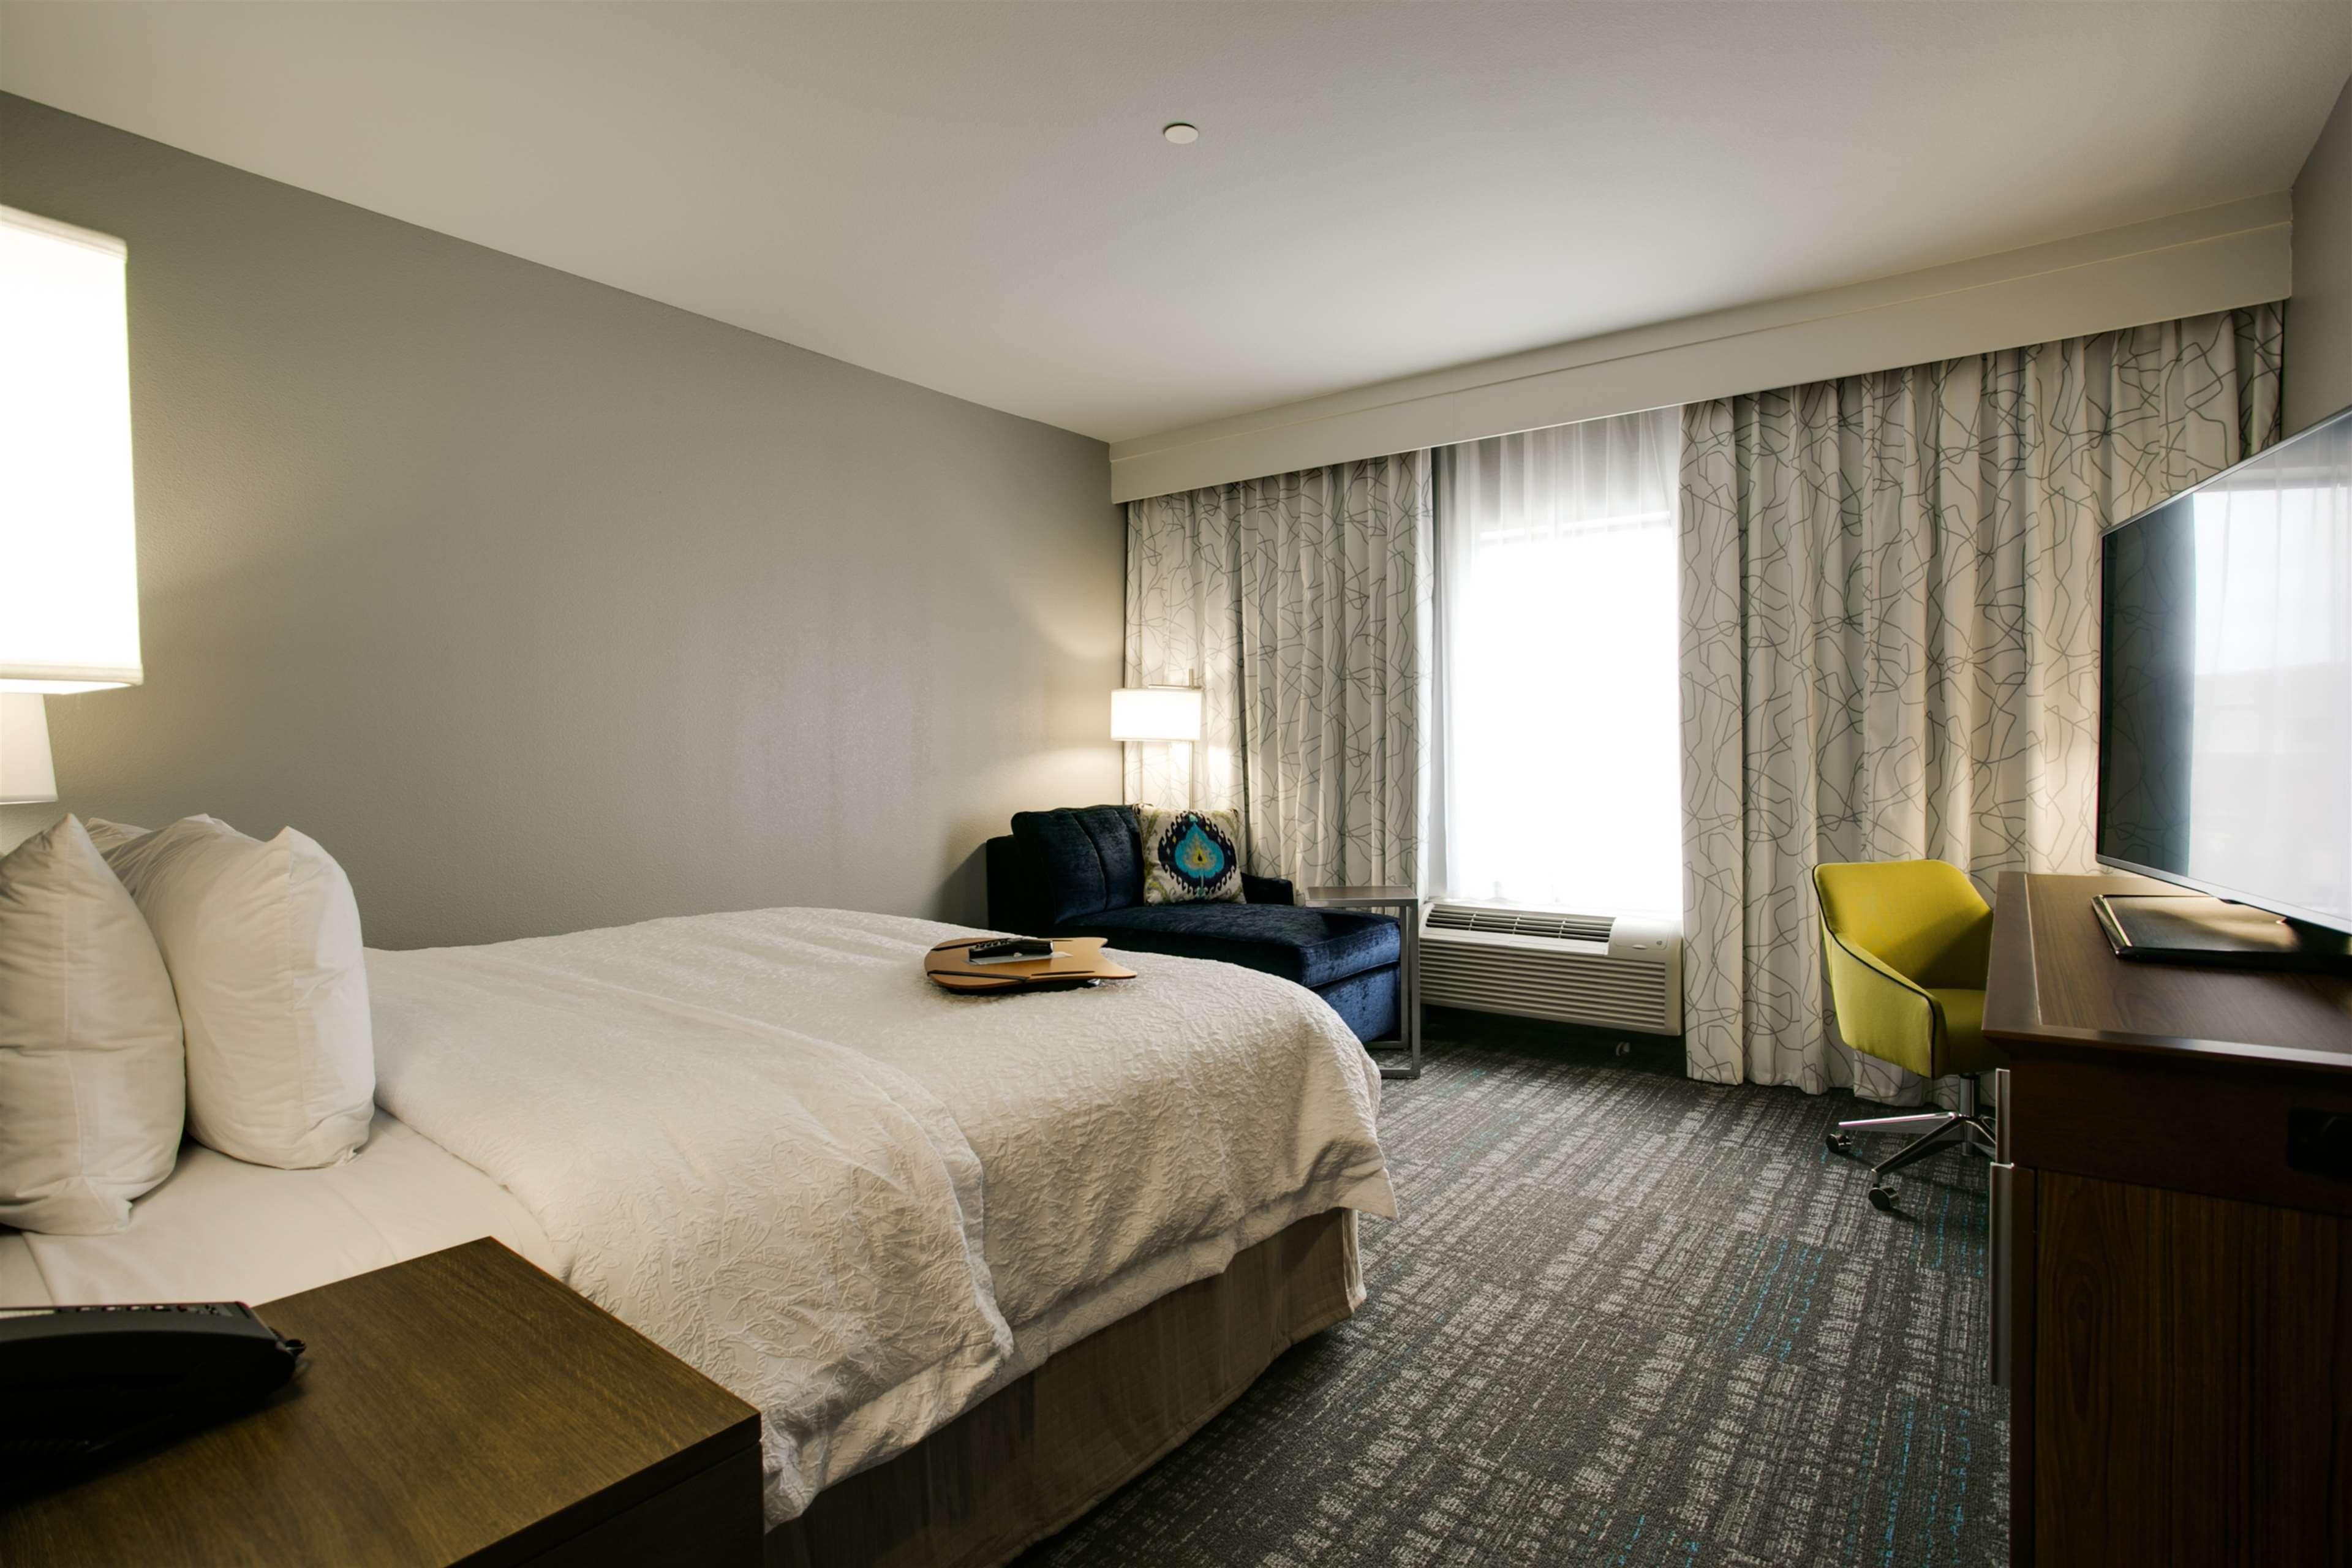 Hampton Inn & Suites Dallas/Ft. Worth Airport South image 26